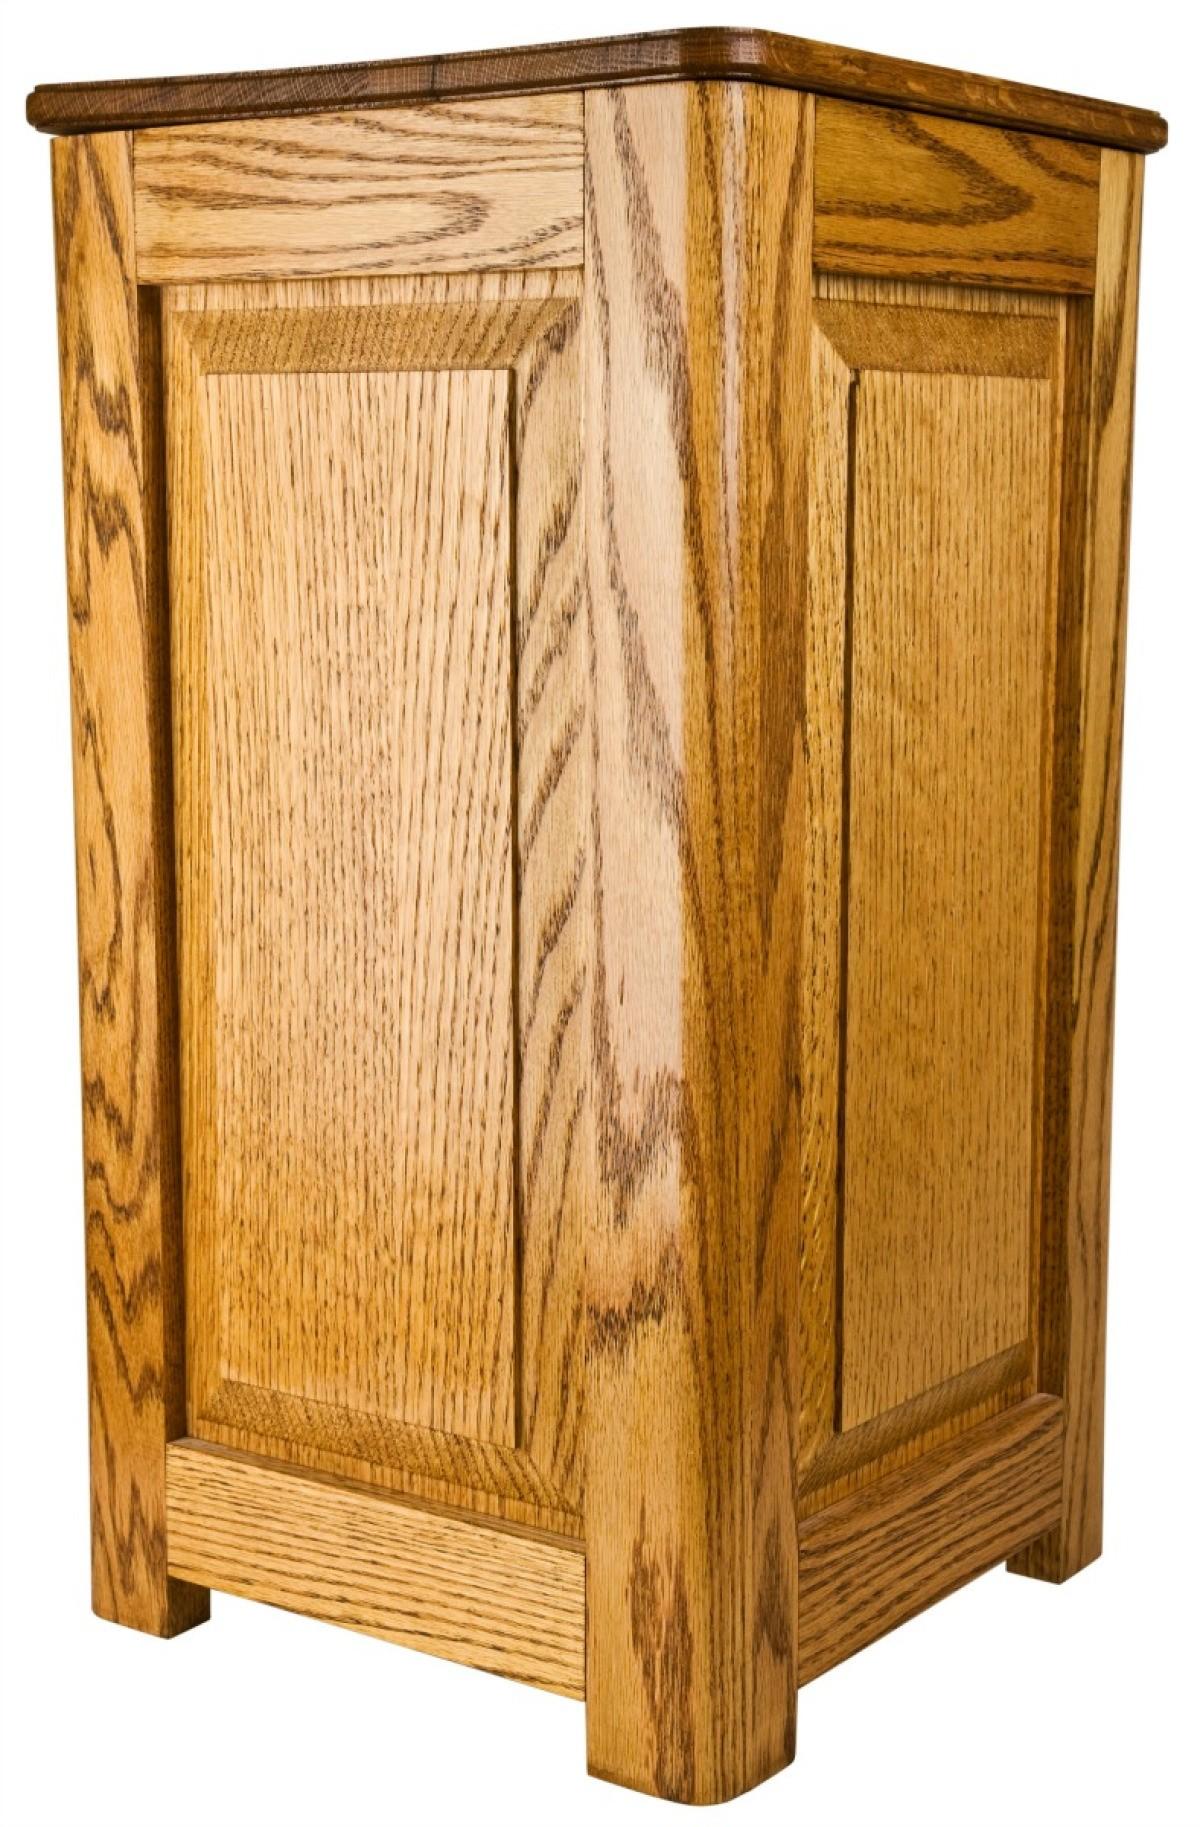 Refinishing Oak Furniture Thriftyfun